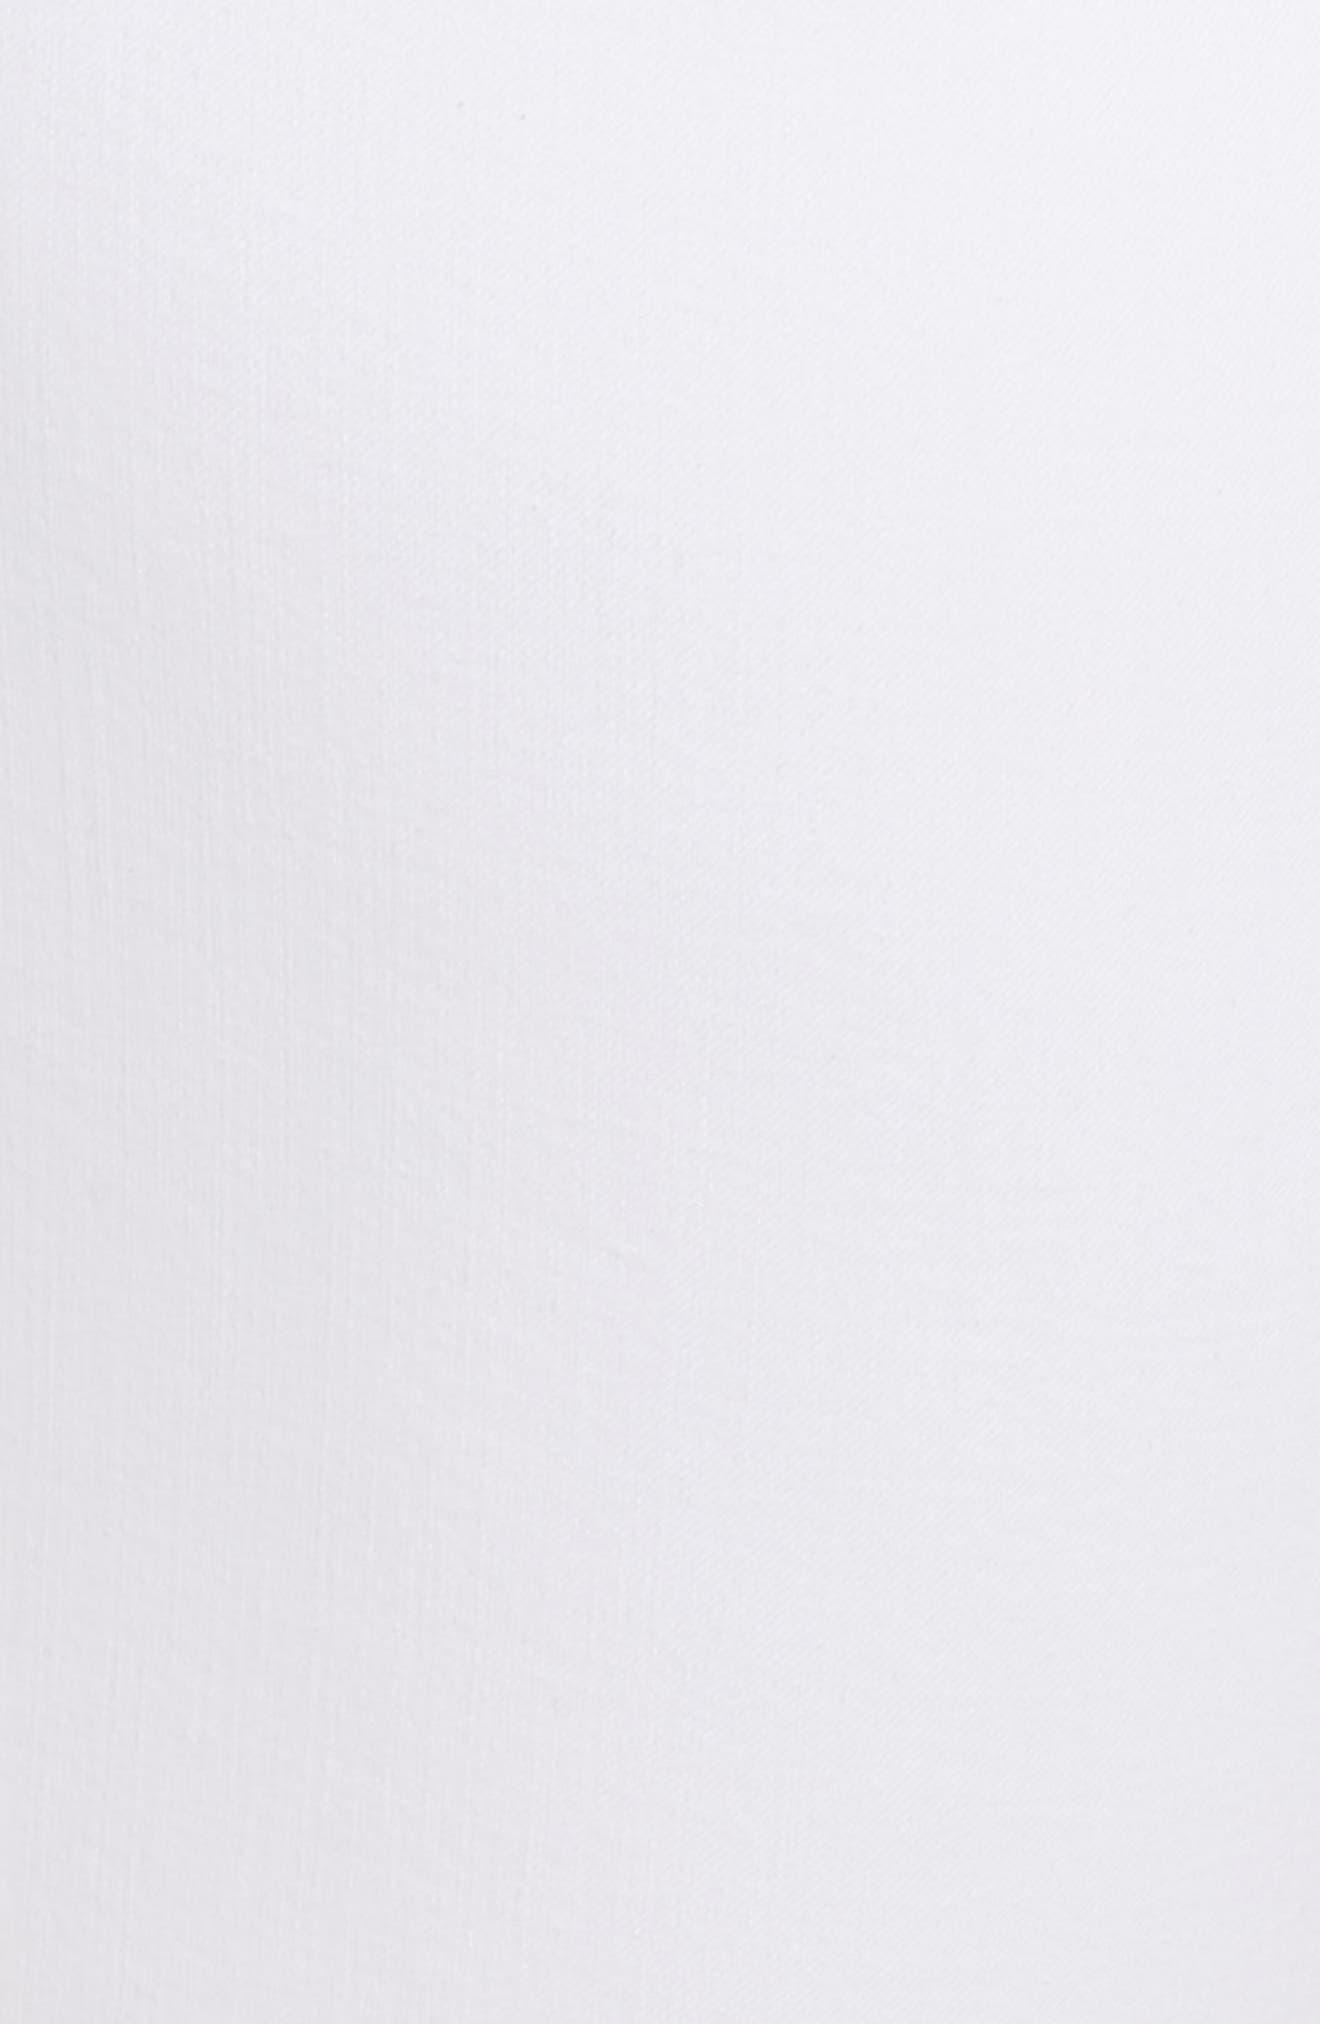 Ab-solution Bermuda Shorts,                             Alternate thumbnail 6, color,                             Optic White